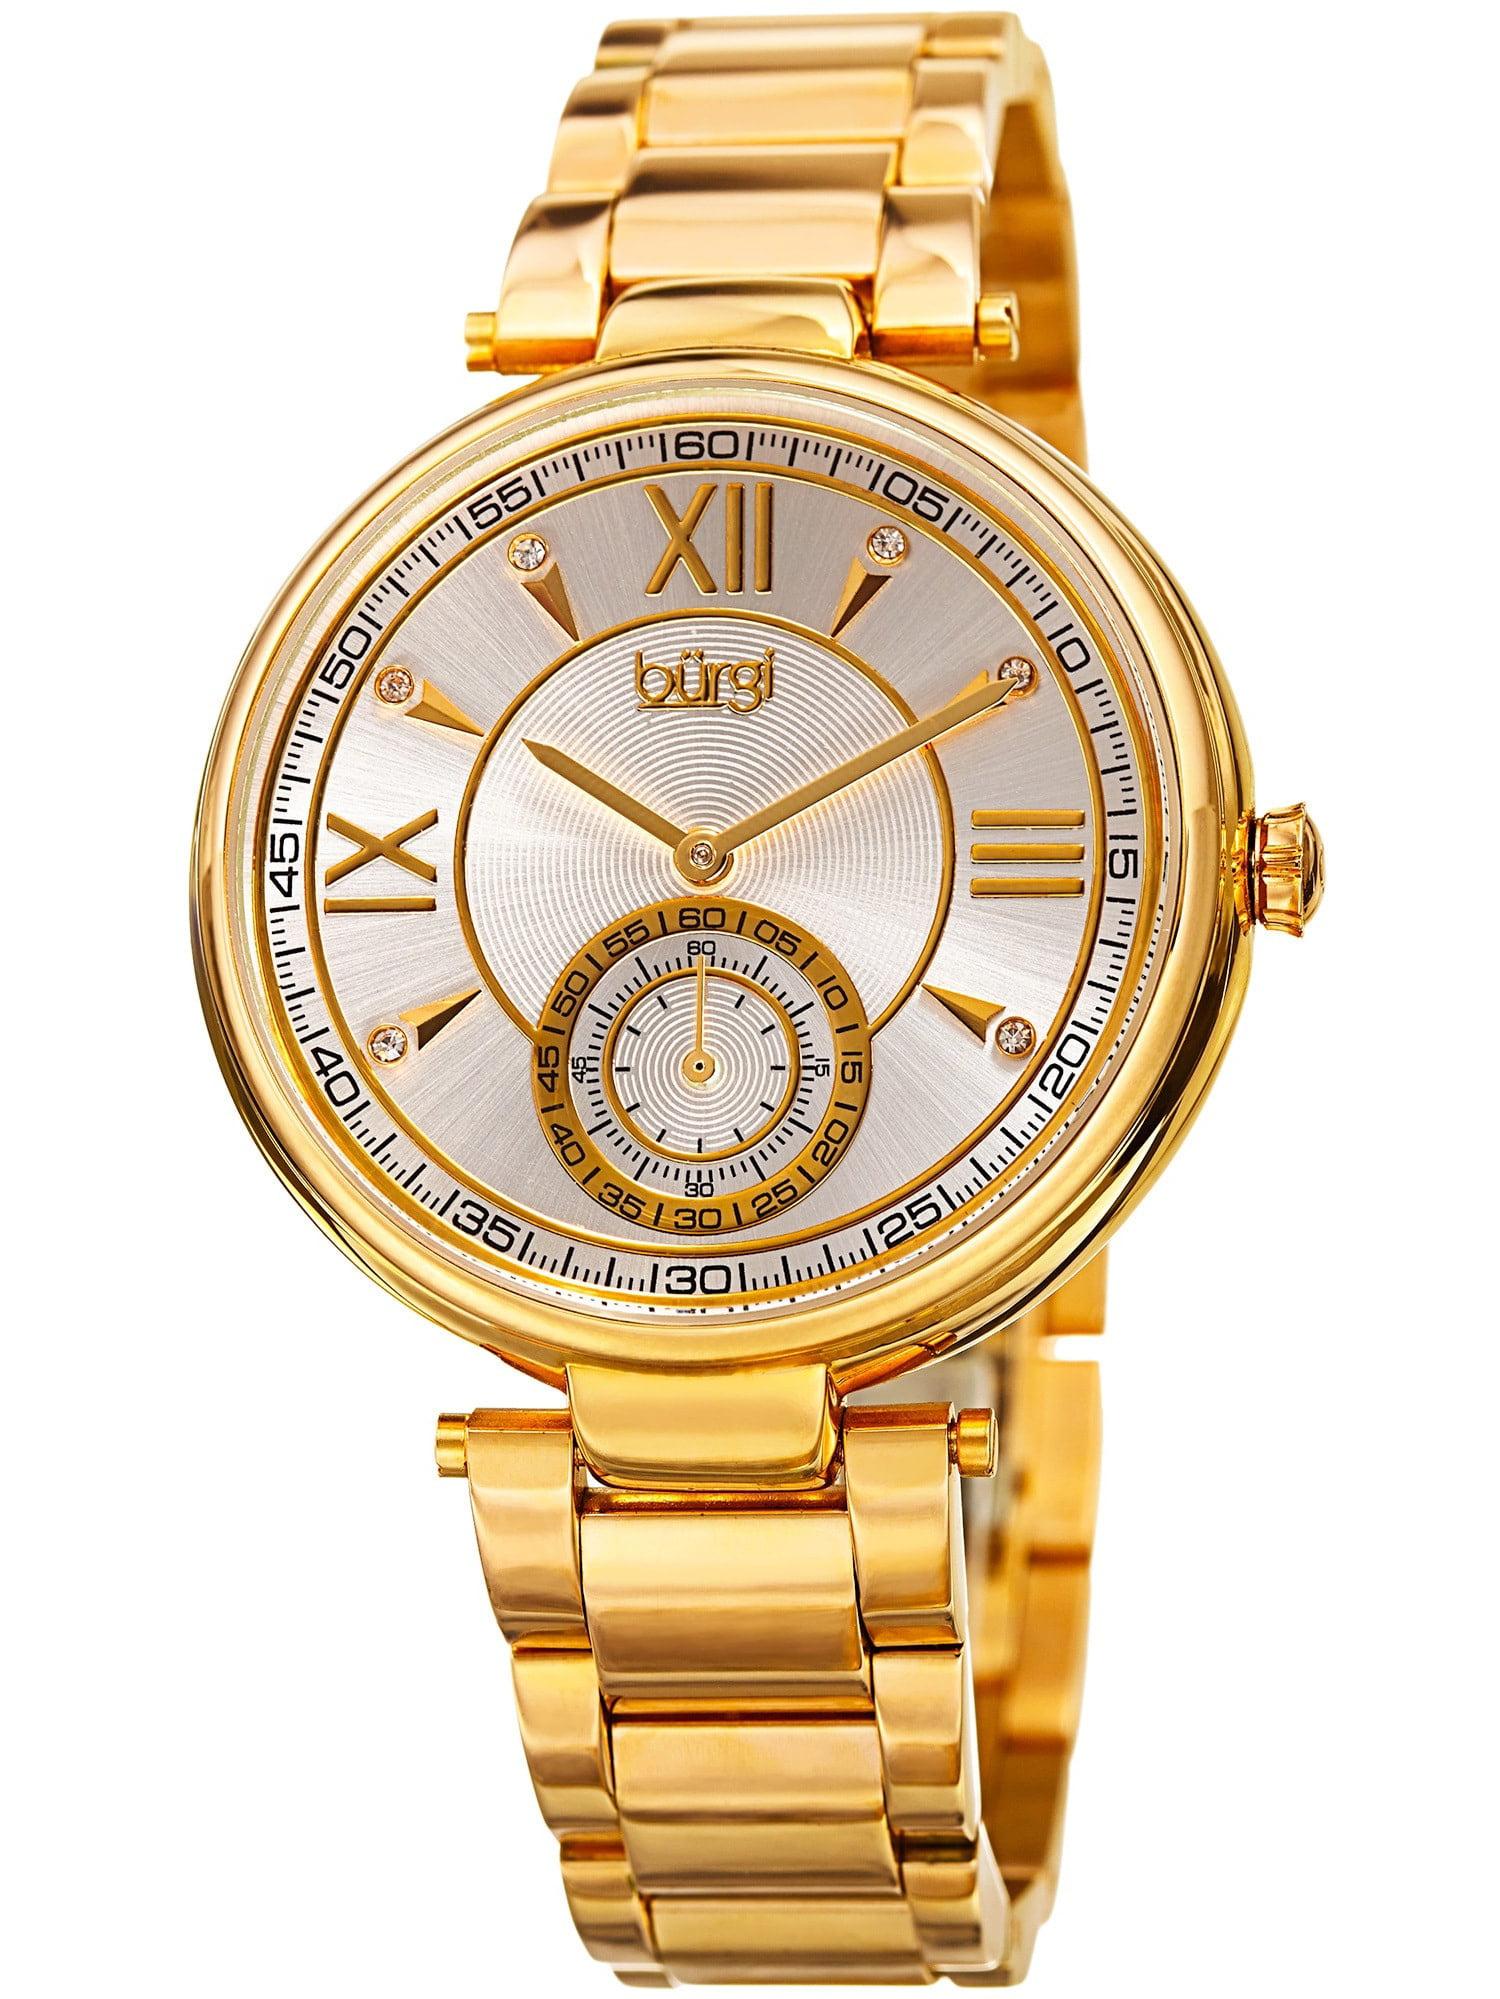 Women's Swarovski Crystal Classic Gold-Tone Stainless Steel Bracelet Watch with FREE Bangle